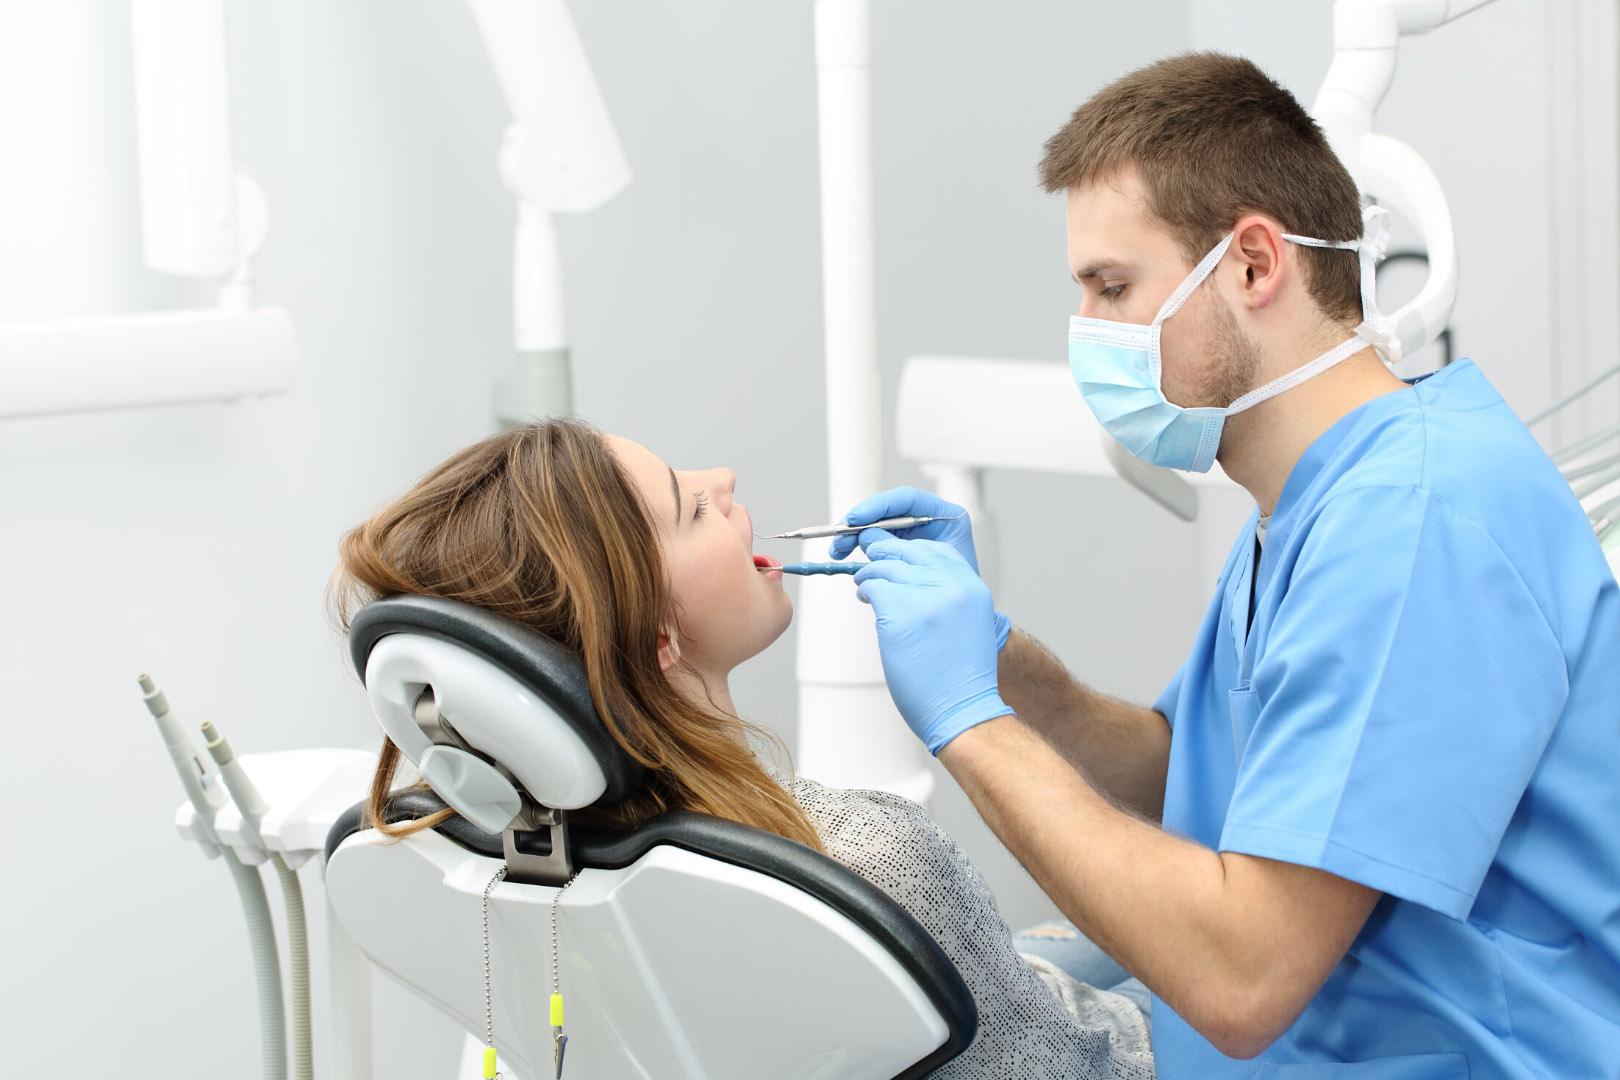 Diagnóstico oral a través de la imagen